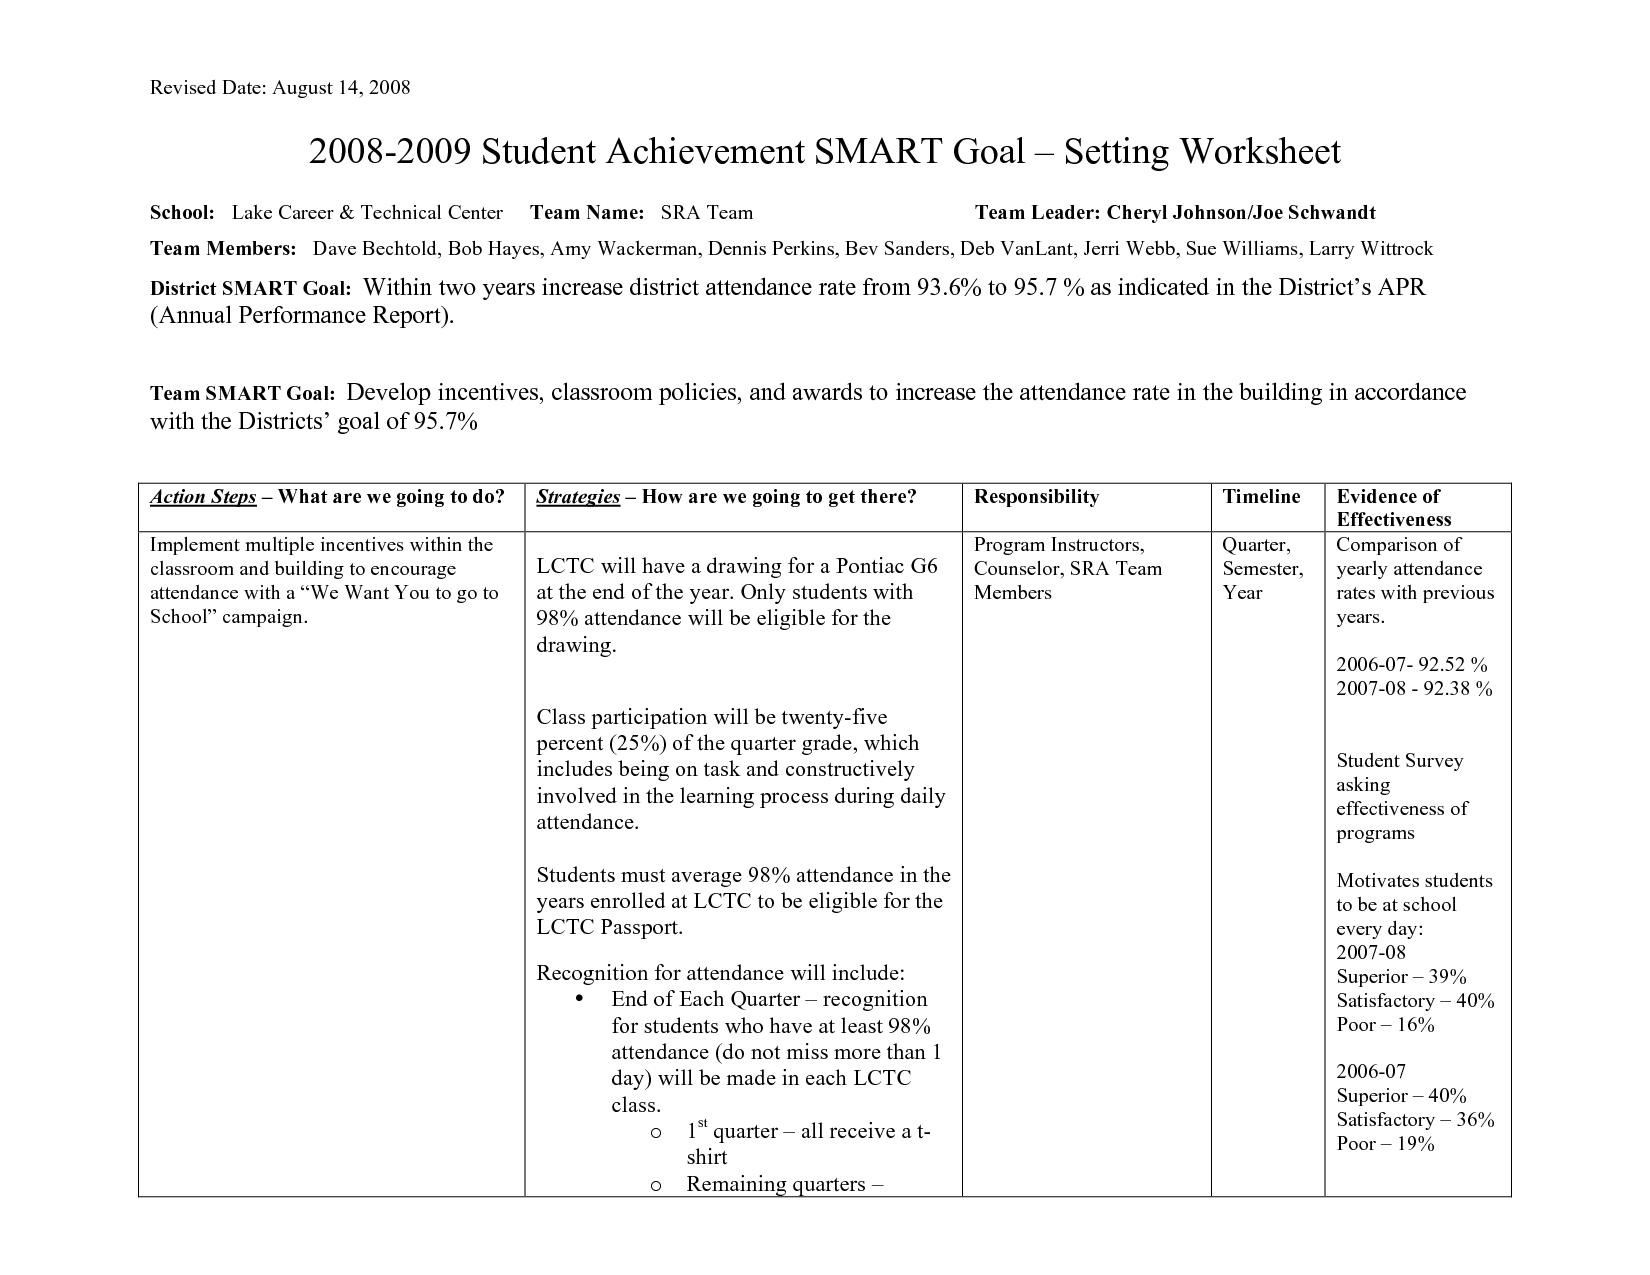 Goal Setting Worksheet High School